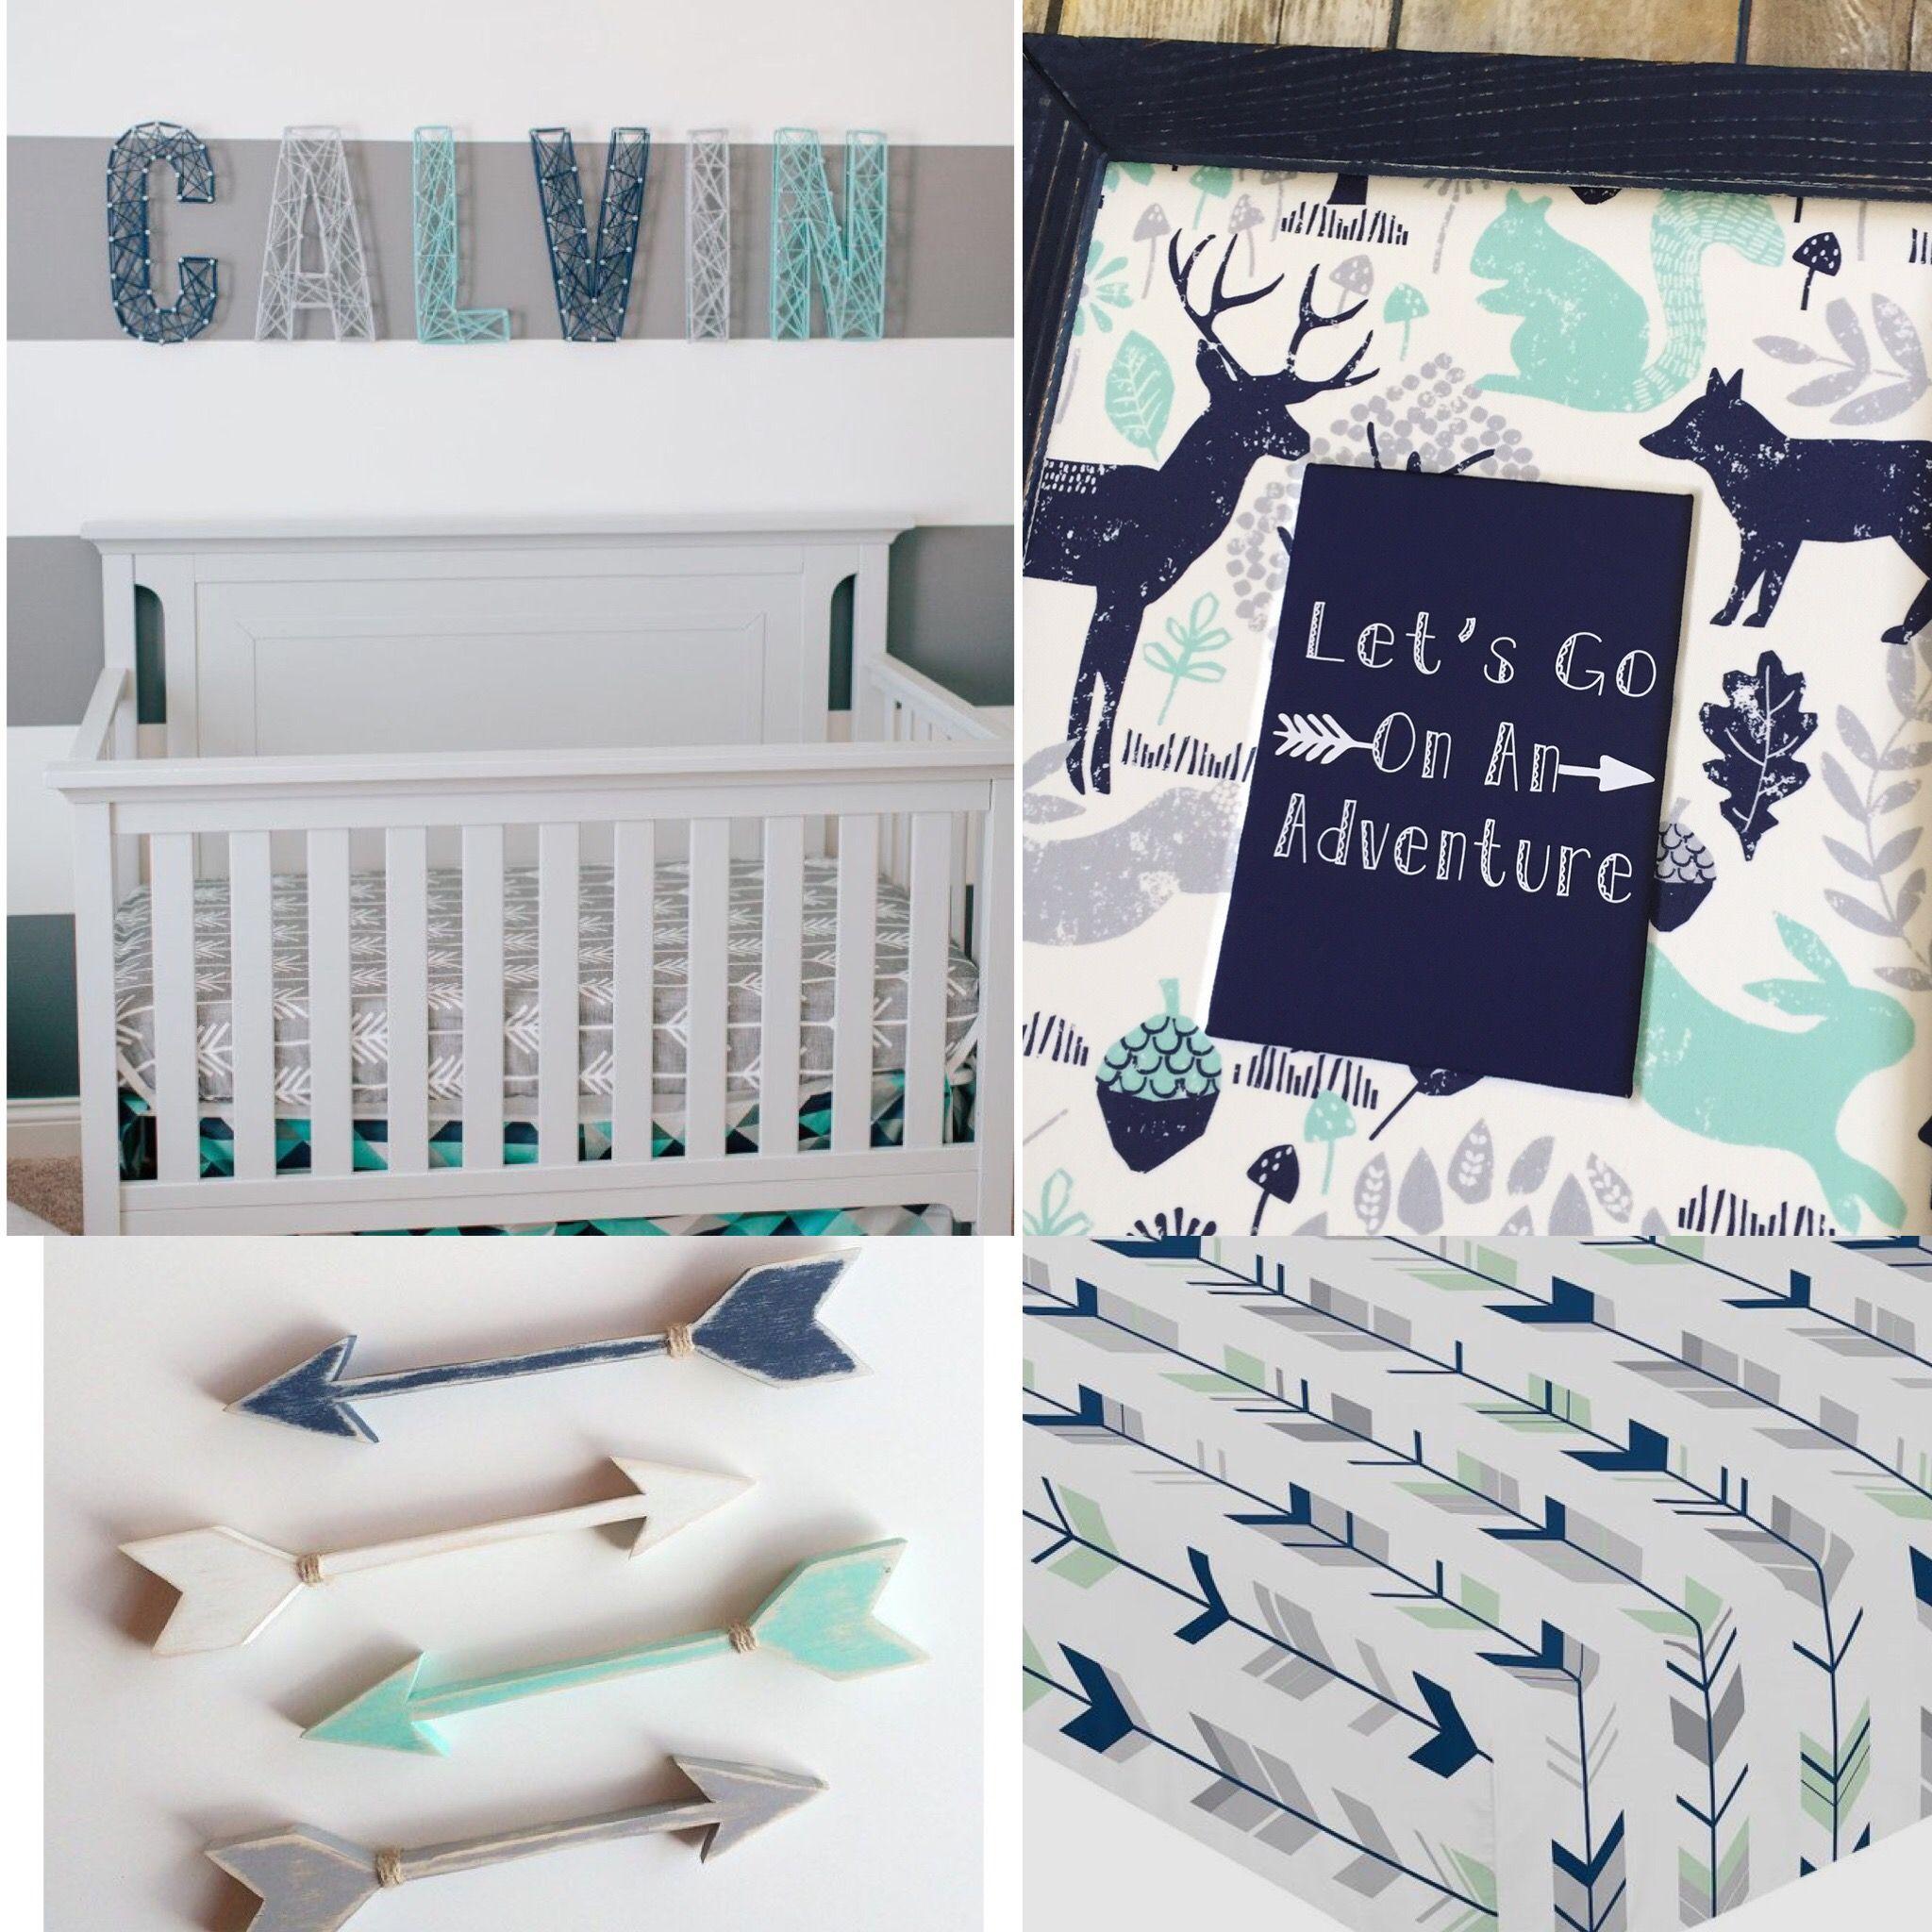 Boy Woodland Nursery Decor Sweet Jojo Designs Woodsy Deer Bedding Navy Blue Mint Gray Toddler Bedroom Playroom